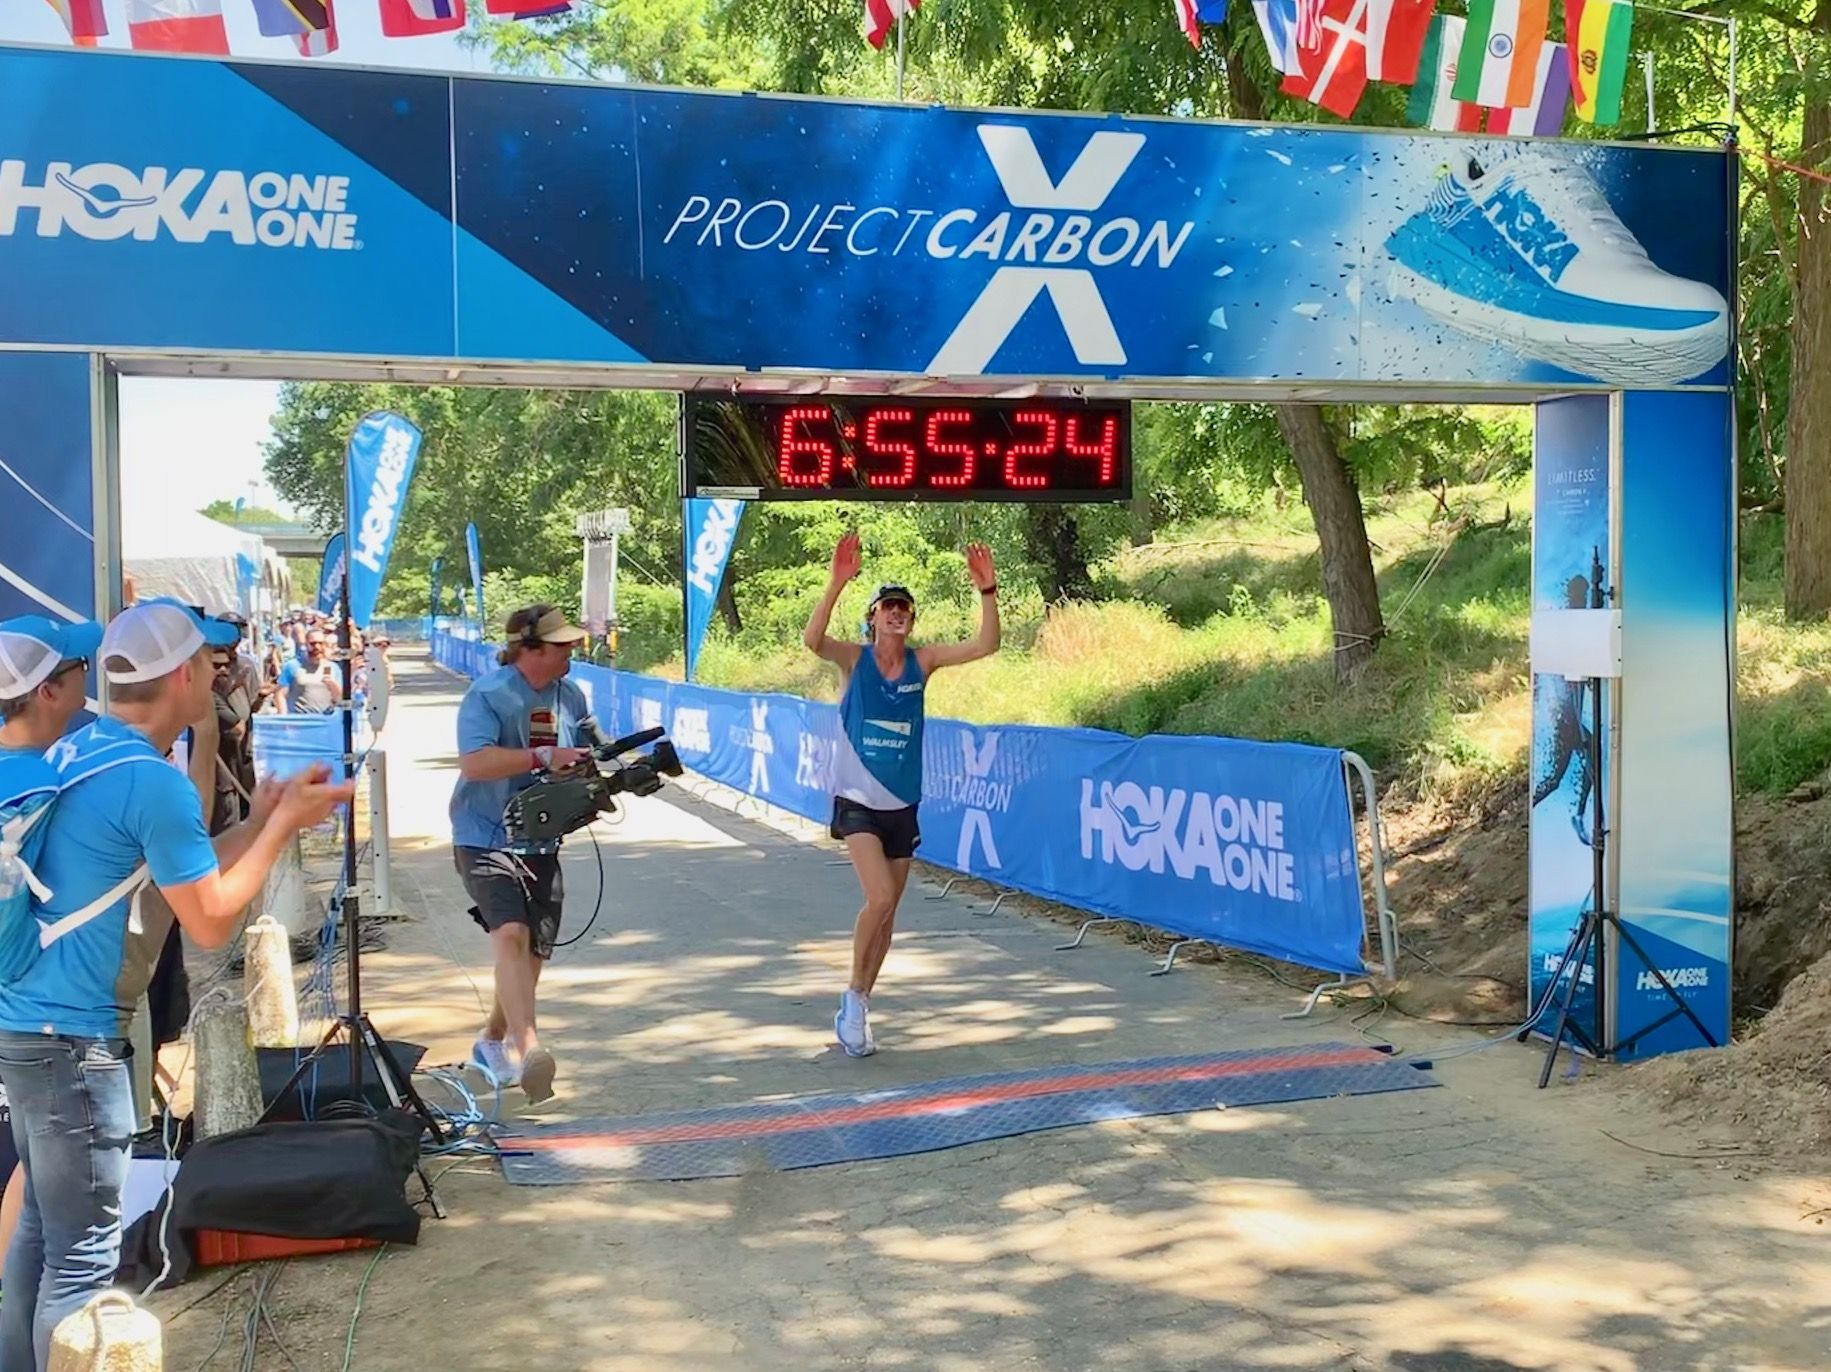 Jim Walmsley Sets New 50-Mile World Best in Hoka One One 100K Challenge